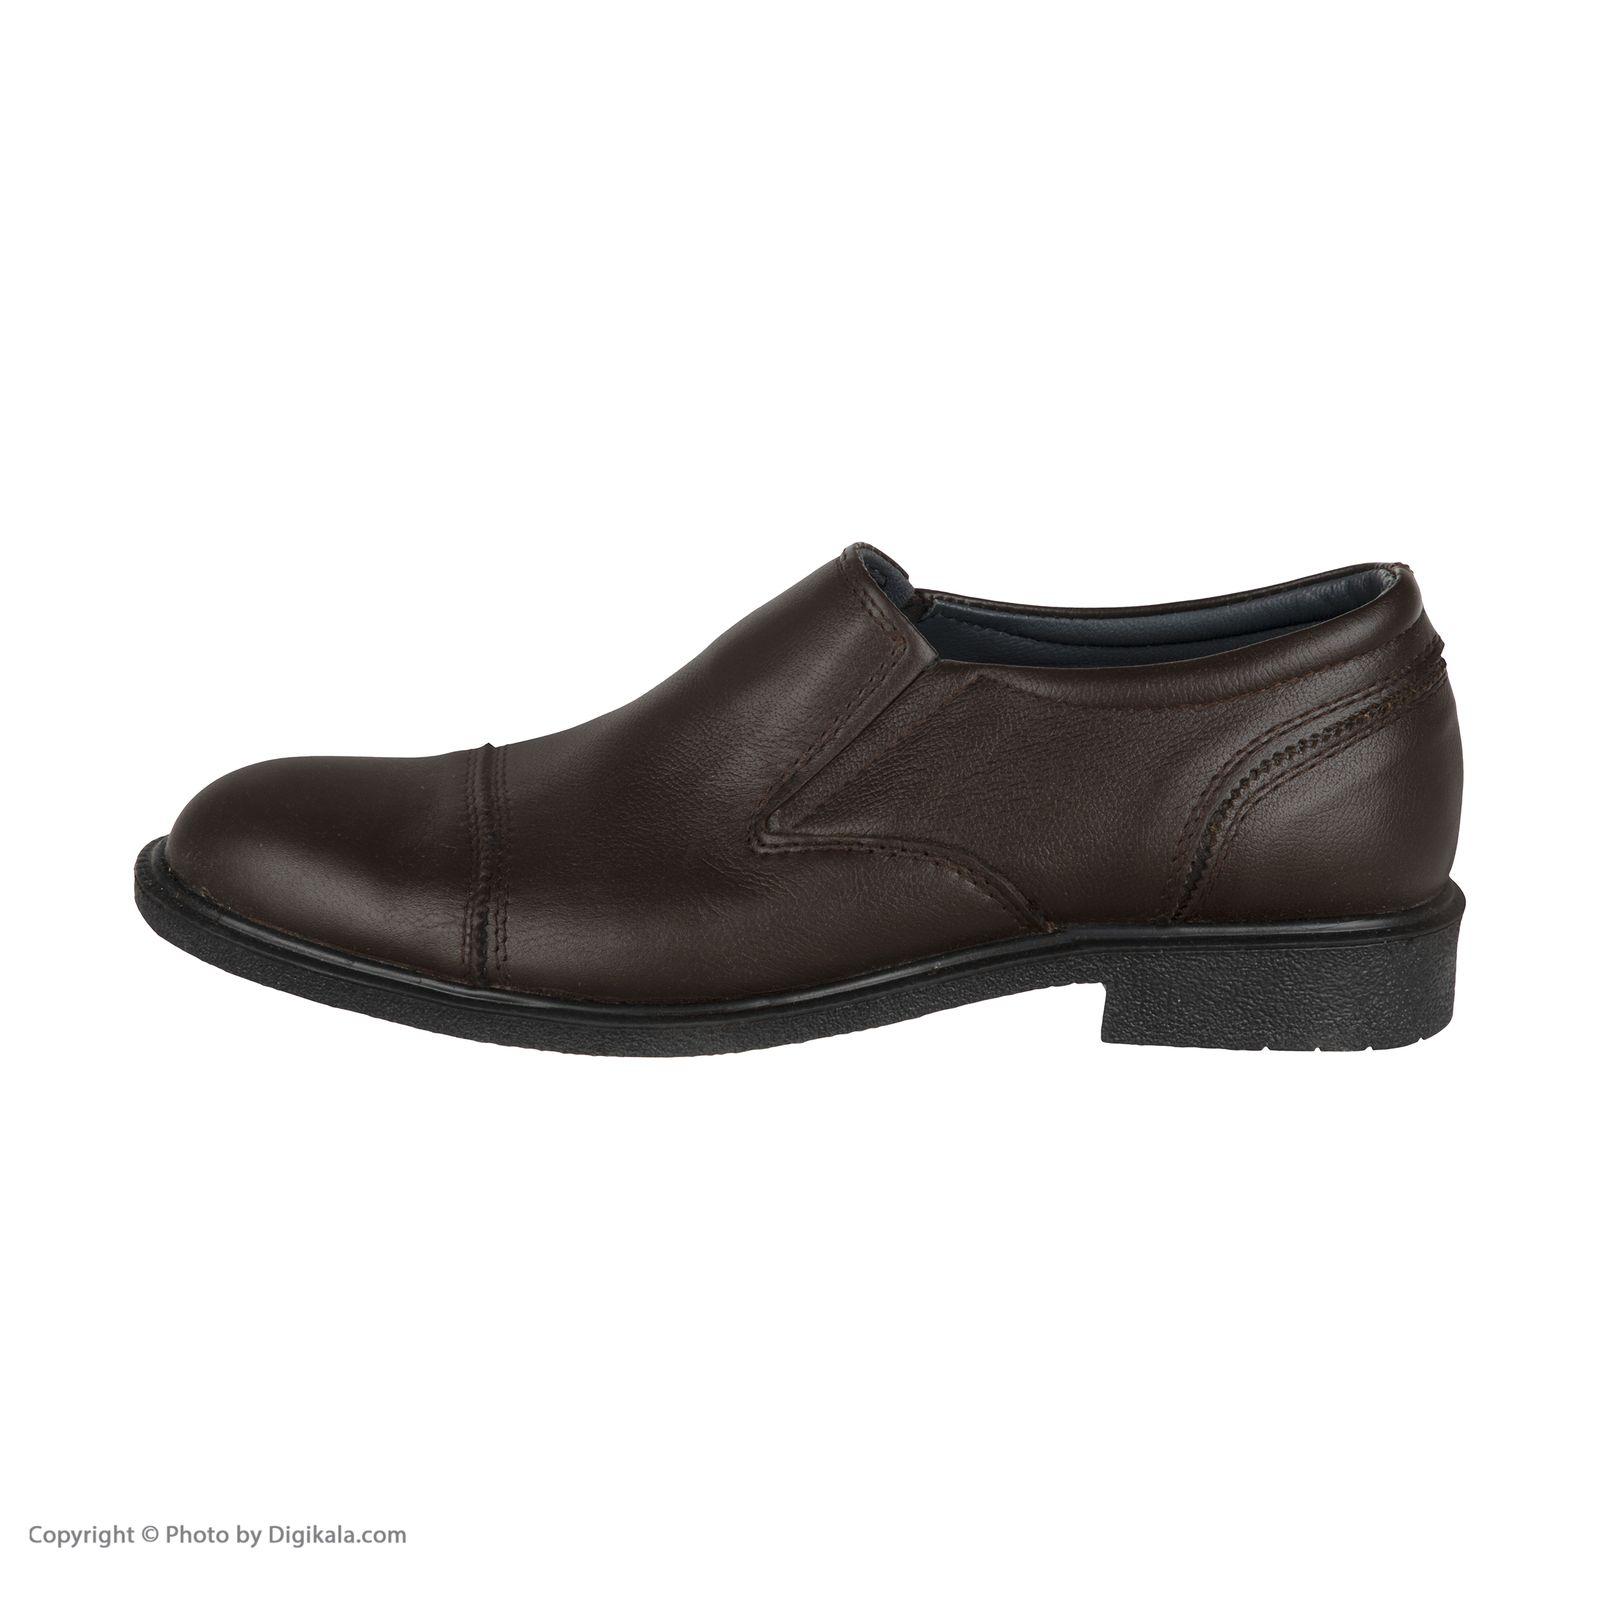 کفش مردانه سوته مدل 4870E503104 -  - 3